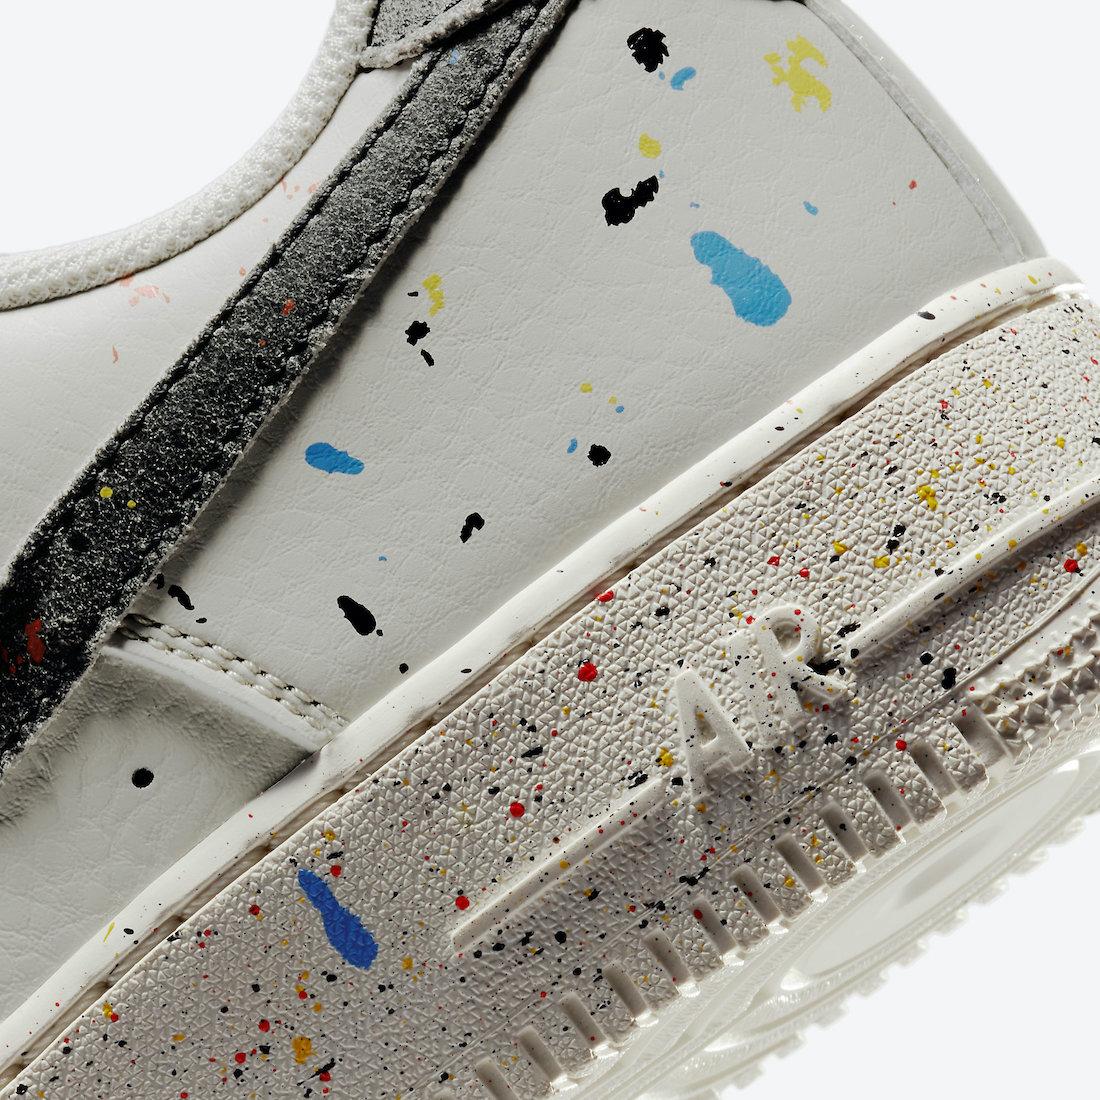 Nike Air Force 1 Low Paint Splatter CZ0339-001 Release Date Info